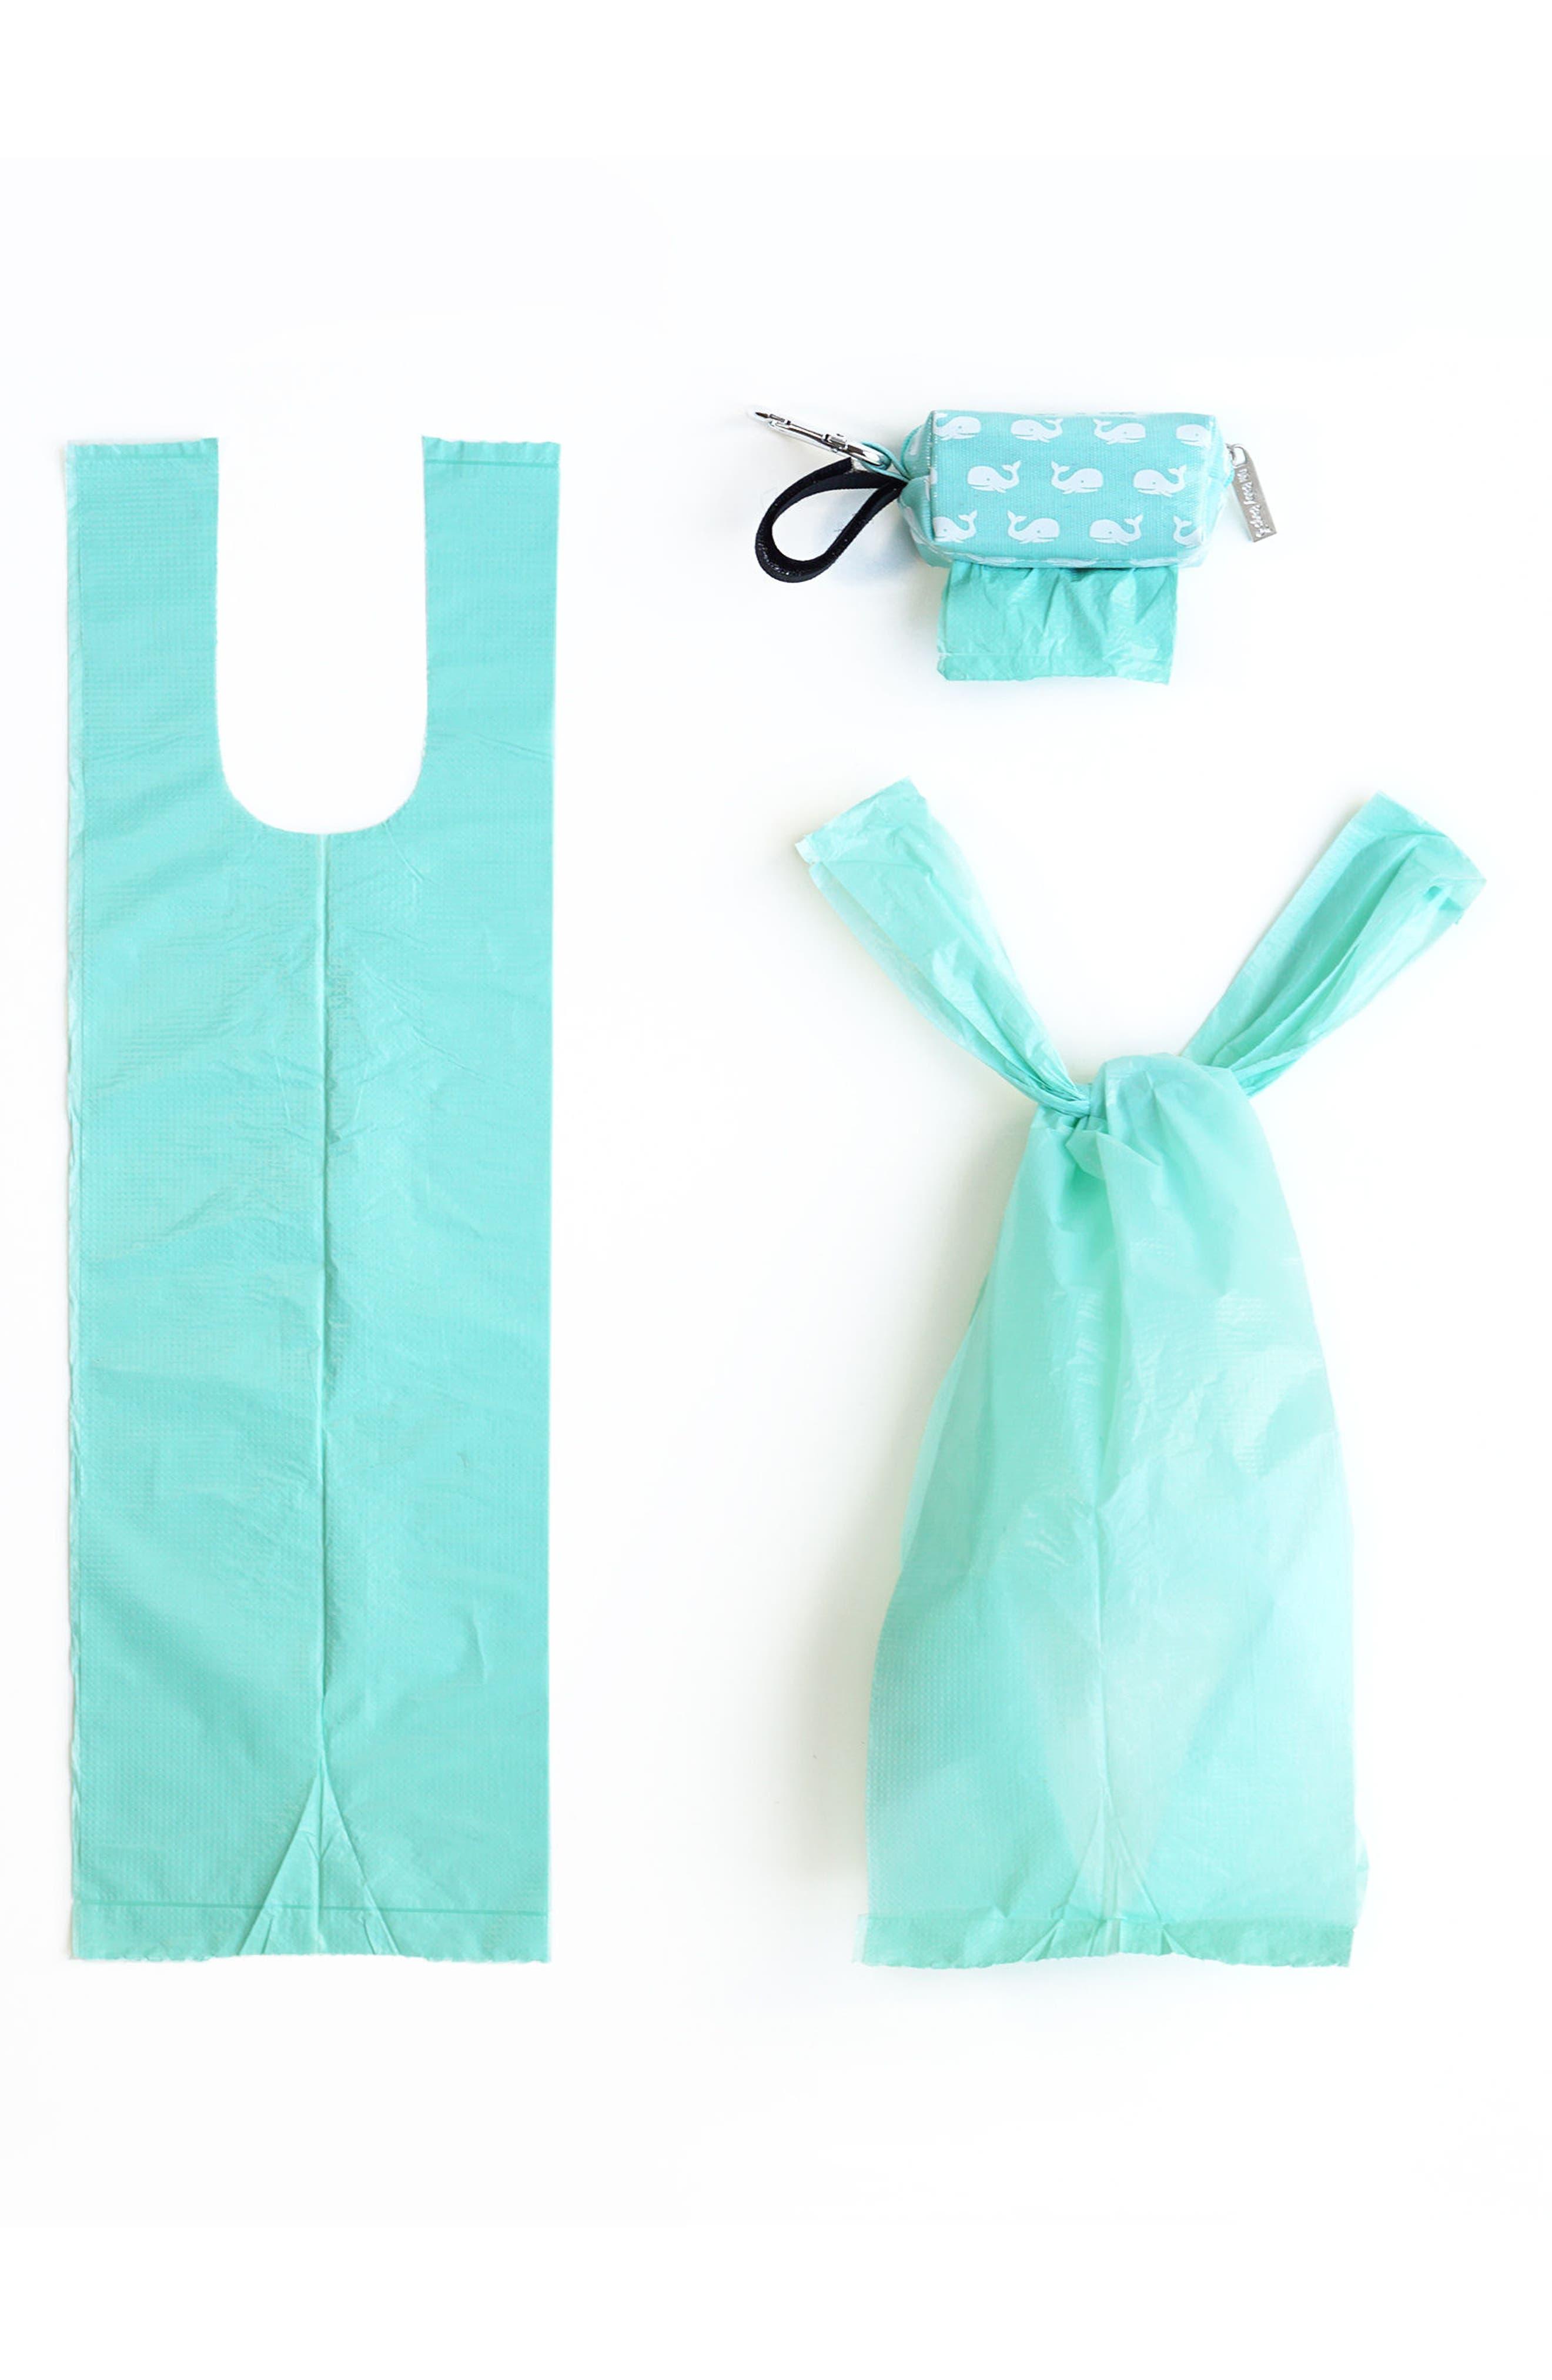 Portable Clip-On Dispenser & Bag Set,                             Alternate thumbnail 3, color,                             Navy/ Seafoam